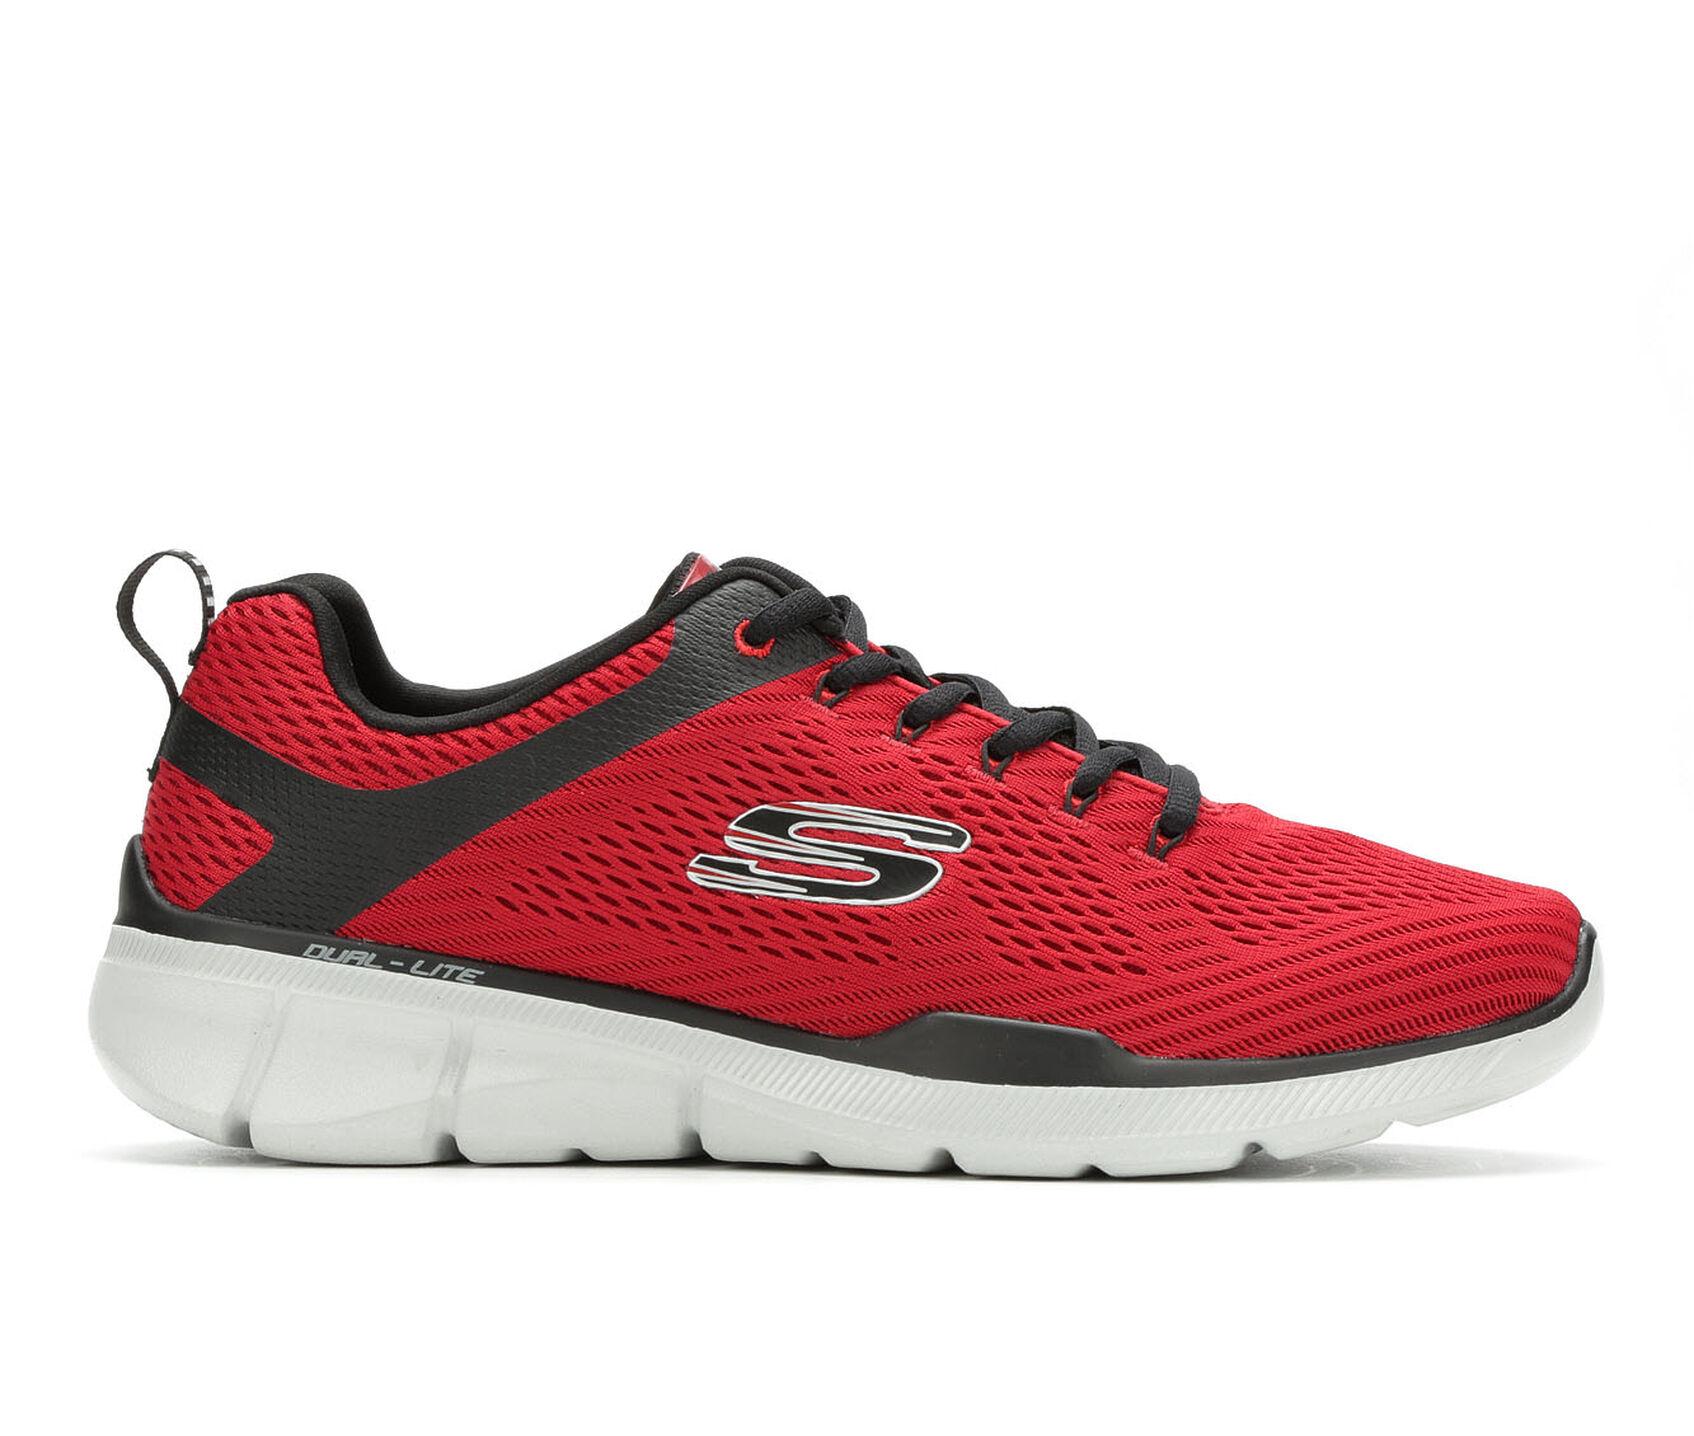 b0528ce48e02 Men s Skechers 52927 Equalizer 3.0 Running Shoes